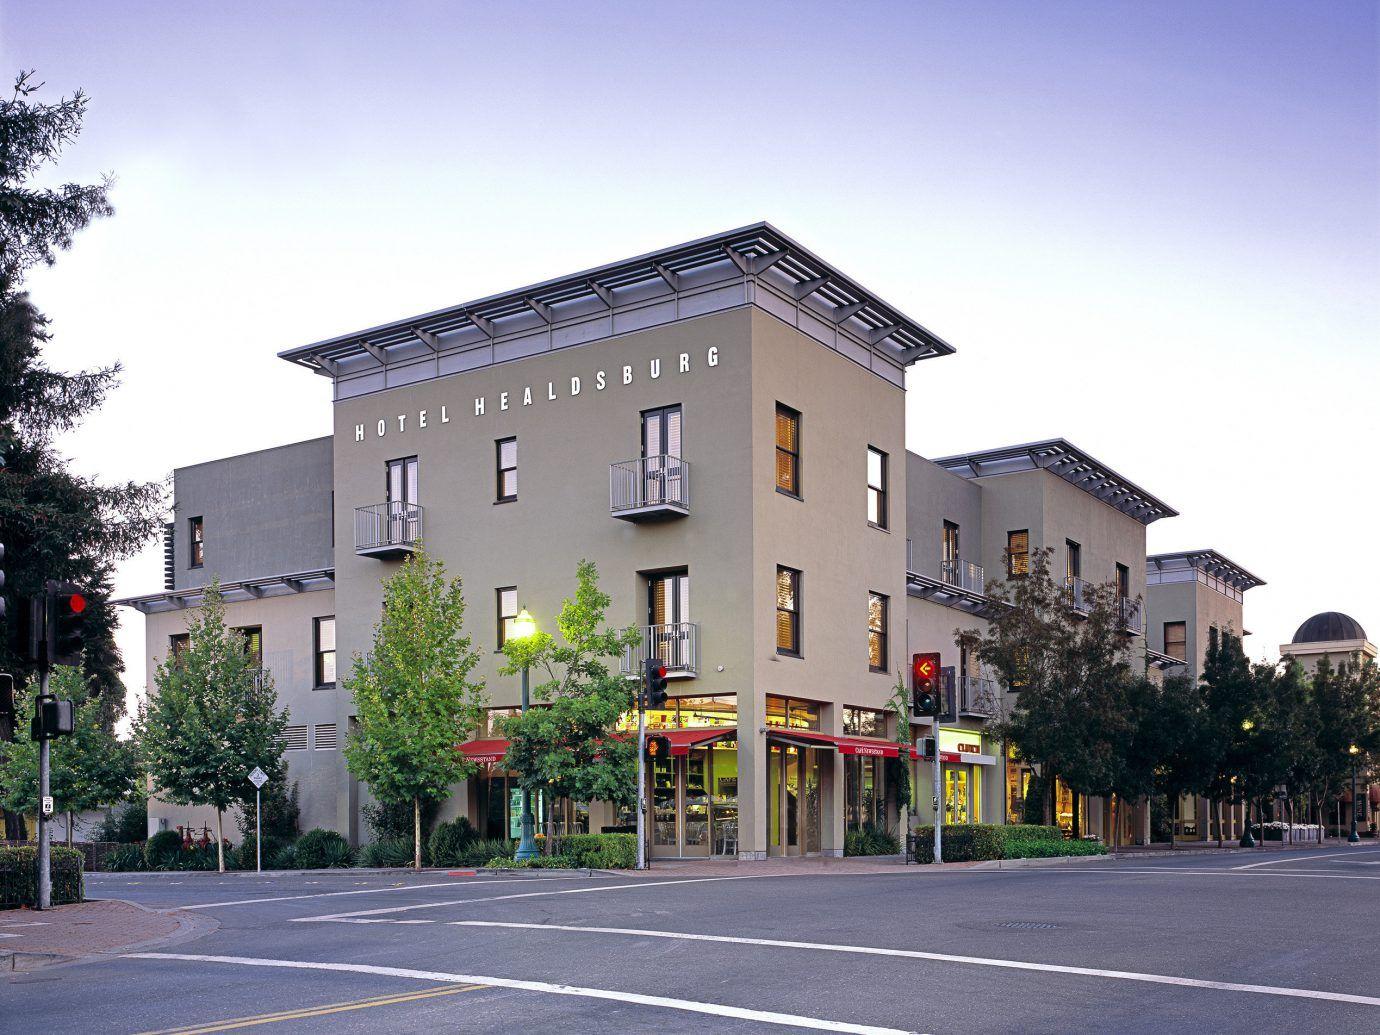 Hotel Healdsburg Healdsburg Ca Healdsburg Hotel Sonoma Wine